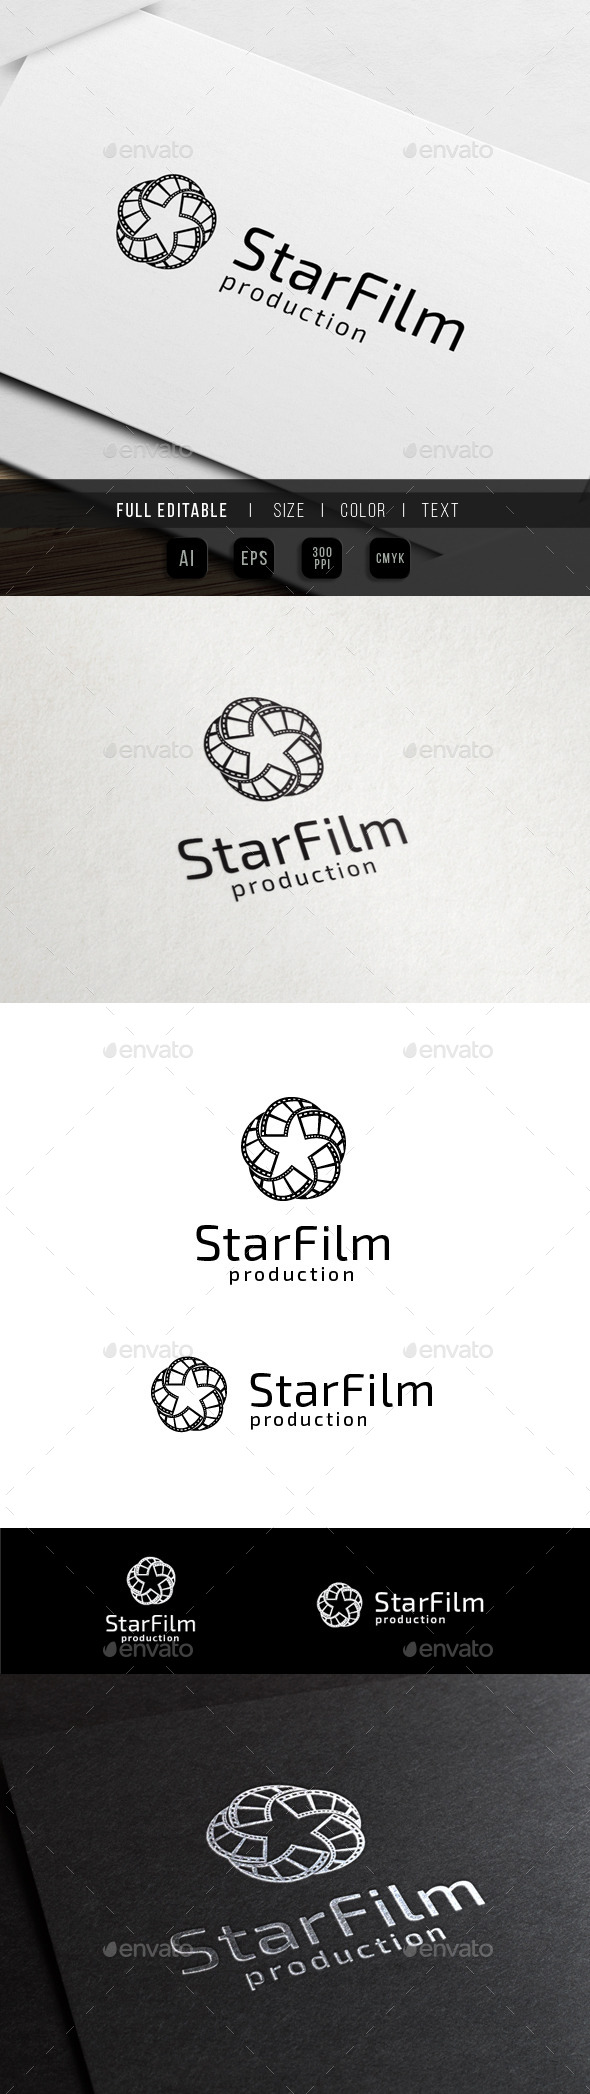 Star Media - Movie Film